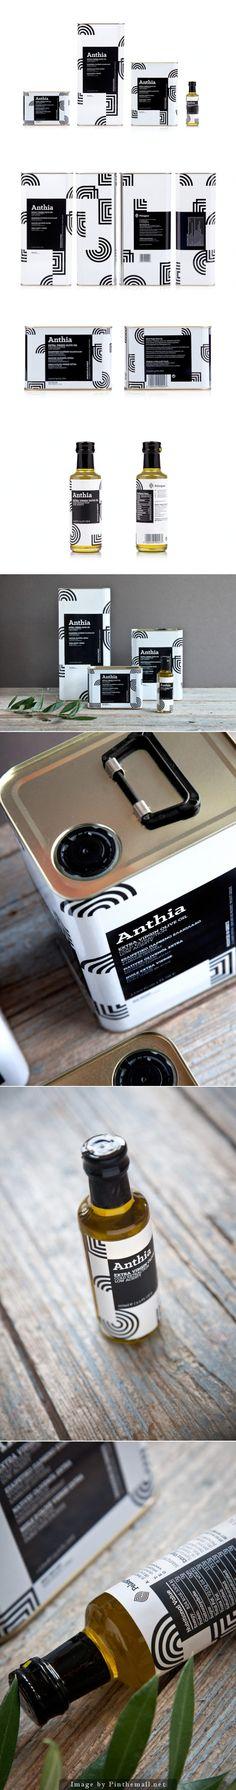 anthia-extra virgin olive oil